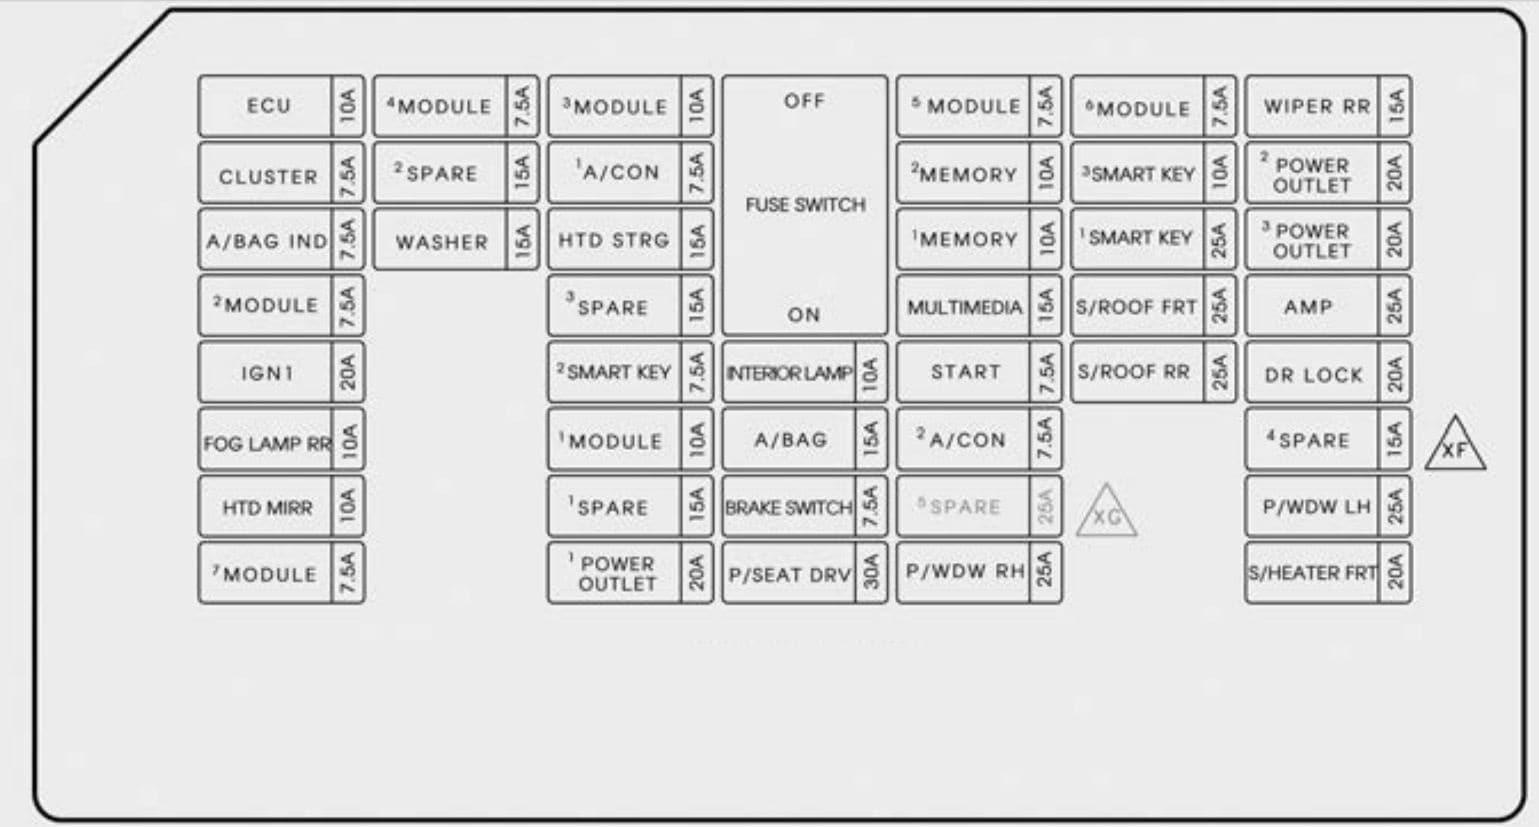 KIA Sedona - fuse box diagram - inner panel